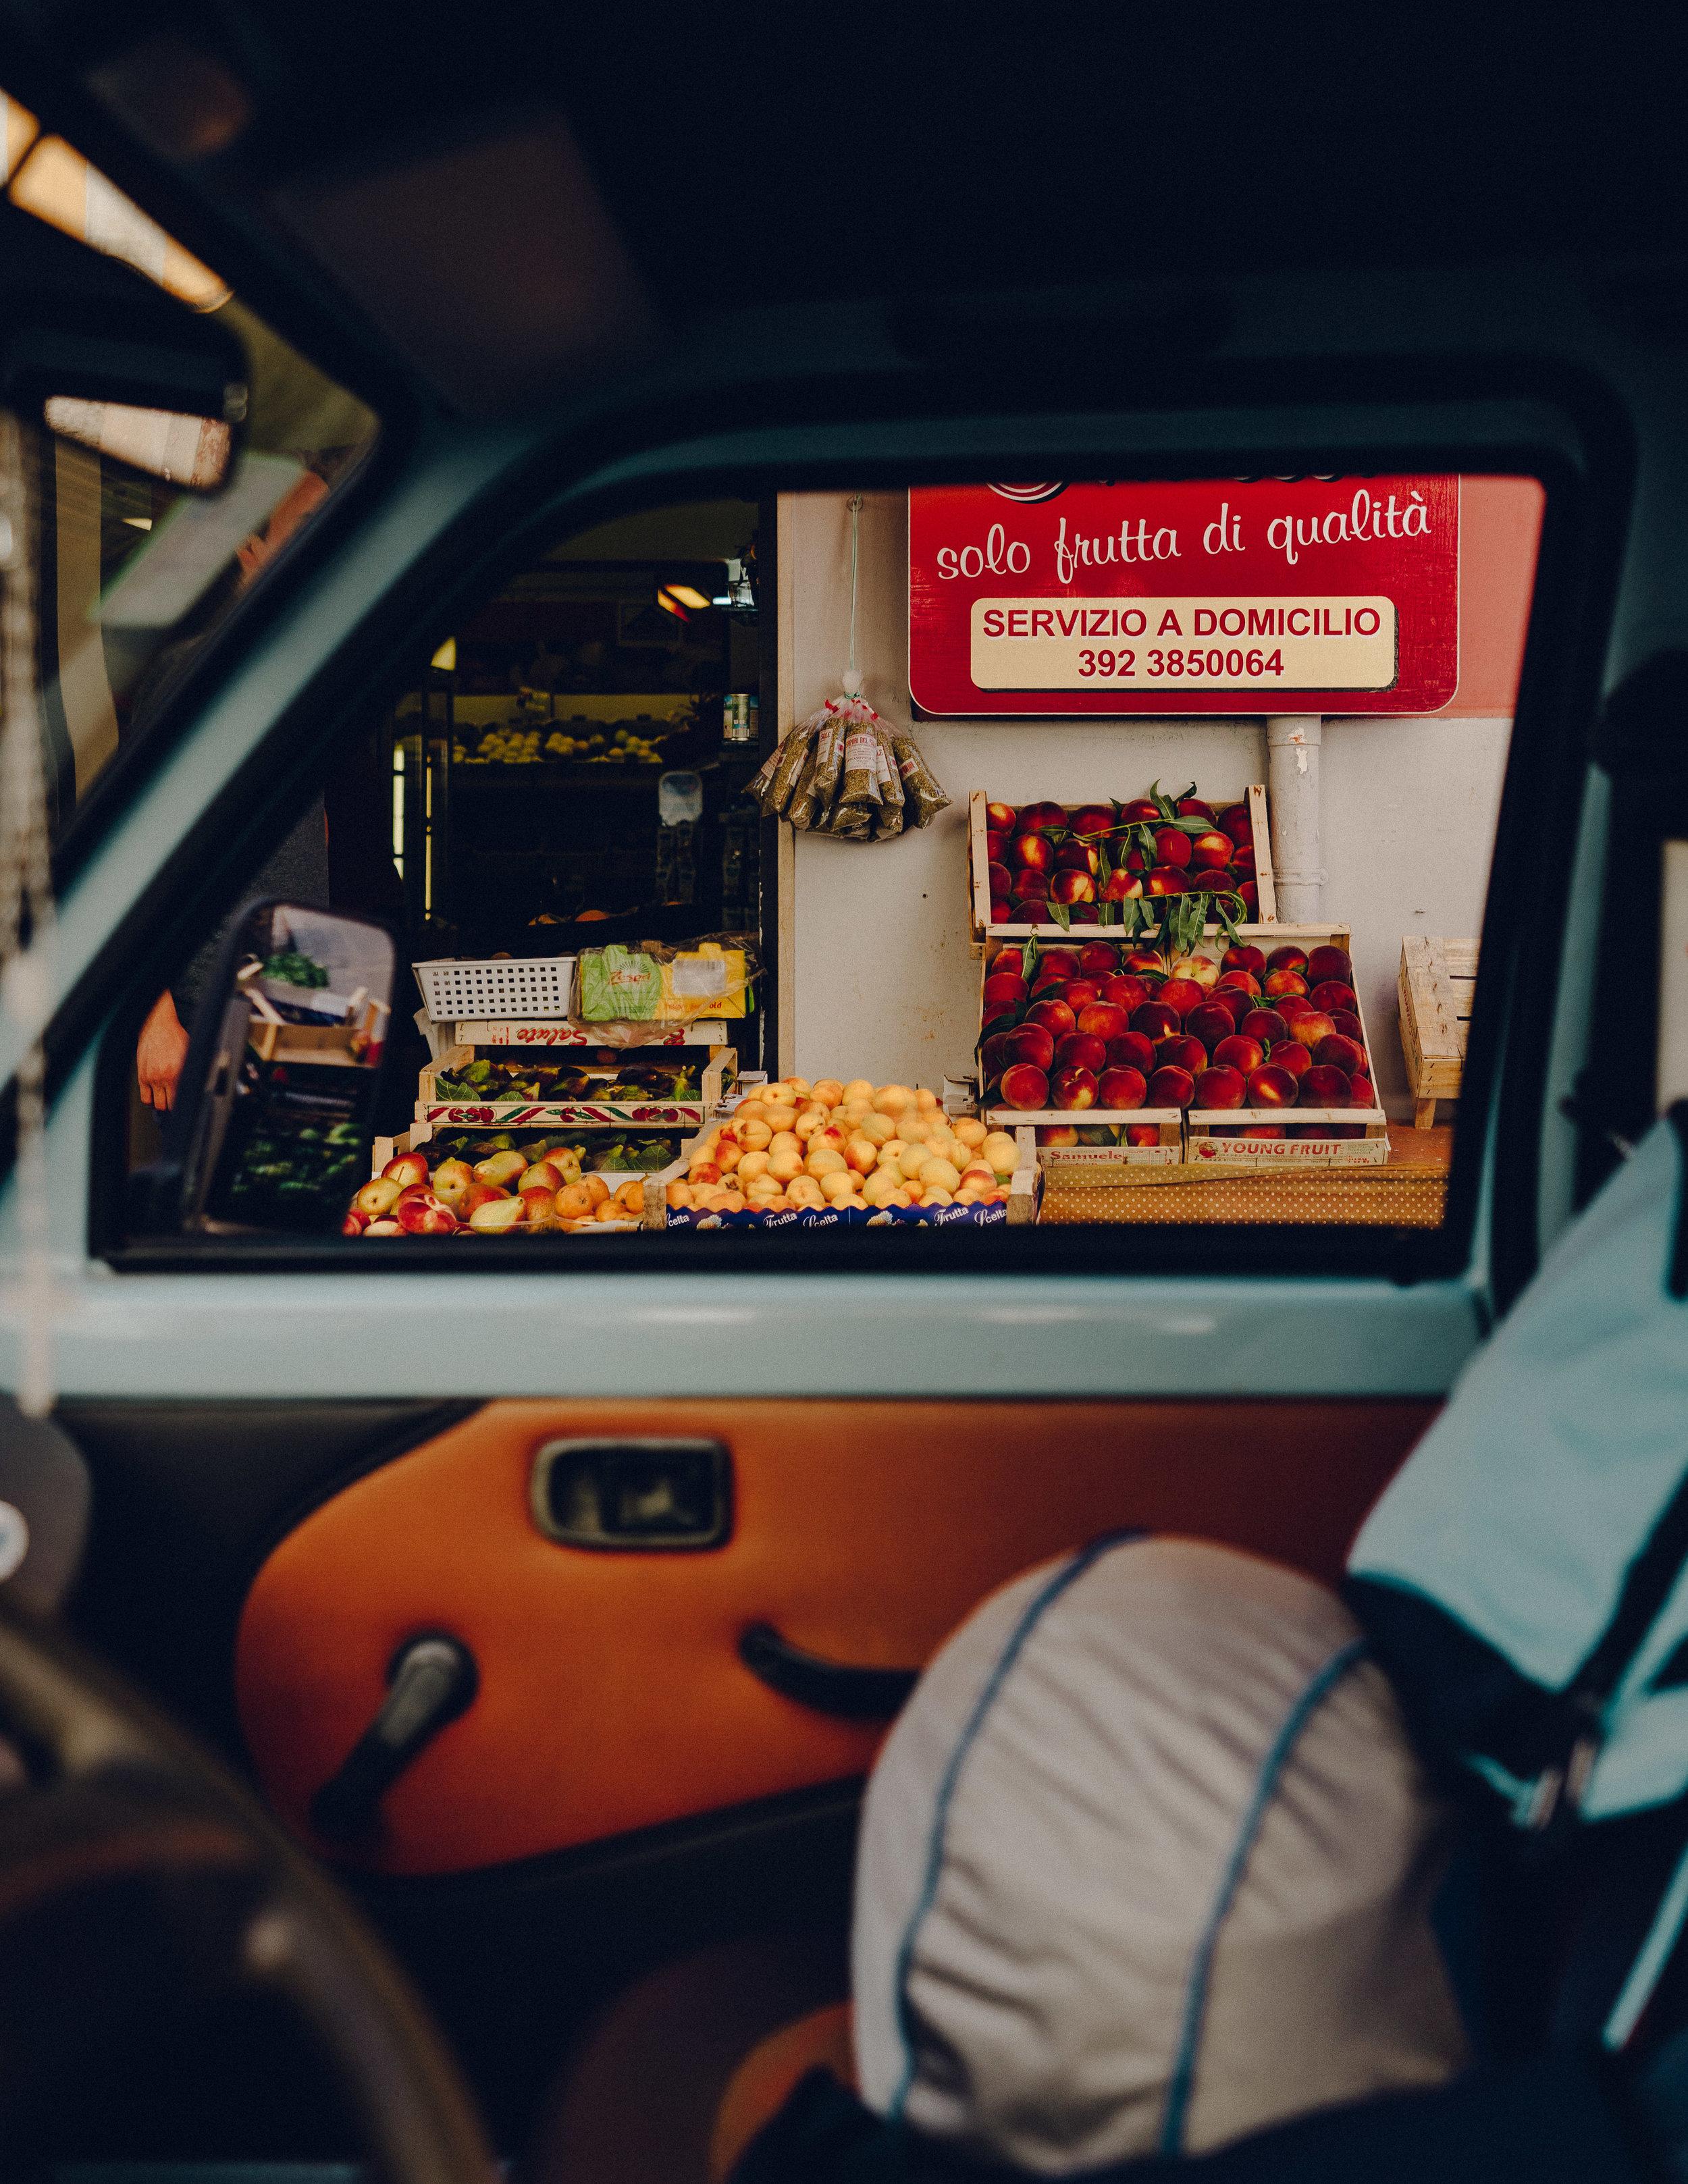 ASROSENVINGE_Roadtrip_Italy_Puglia_Monopoli-07069.jpg